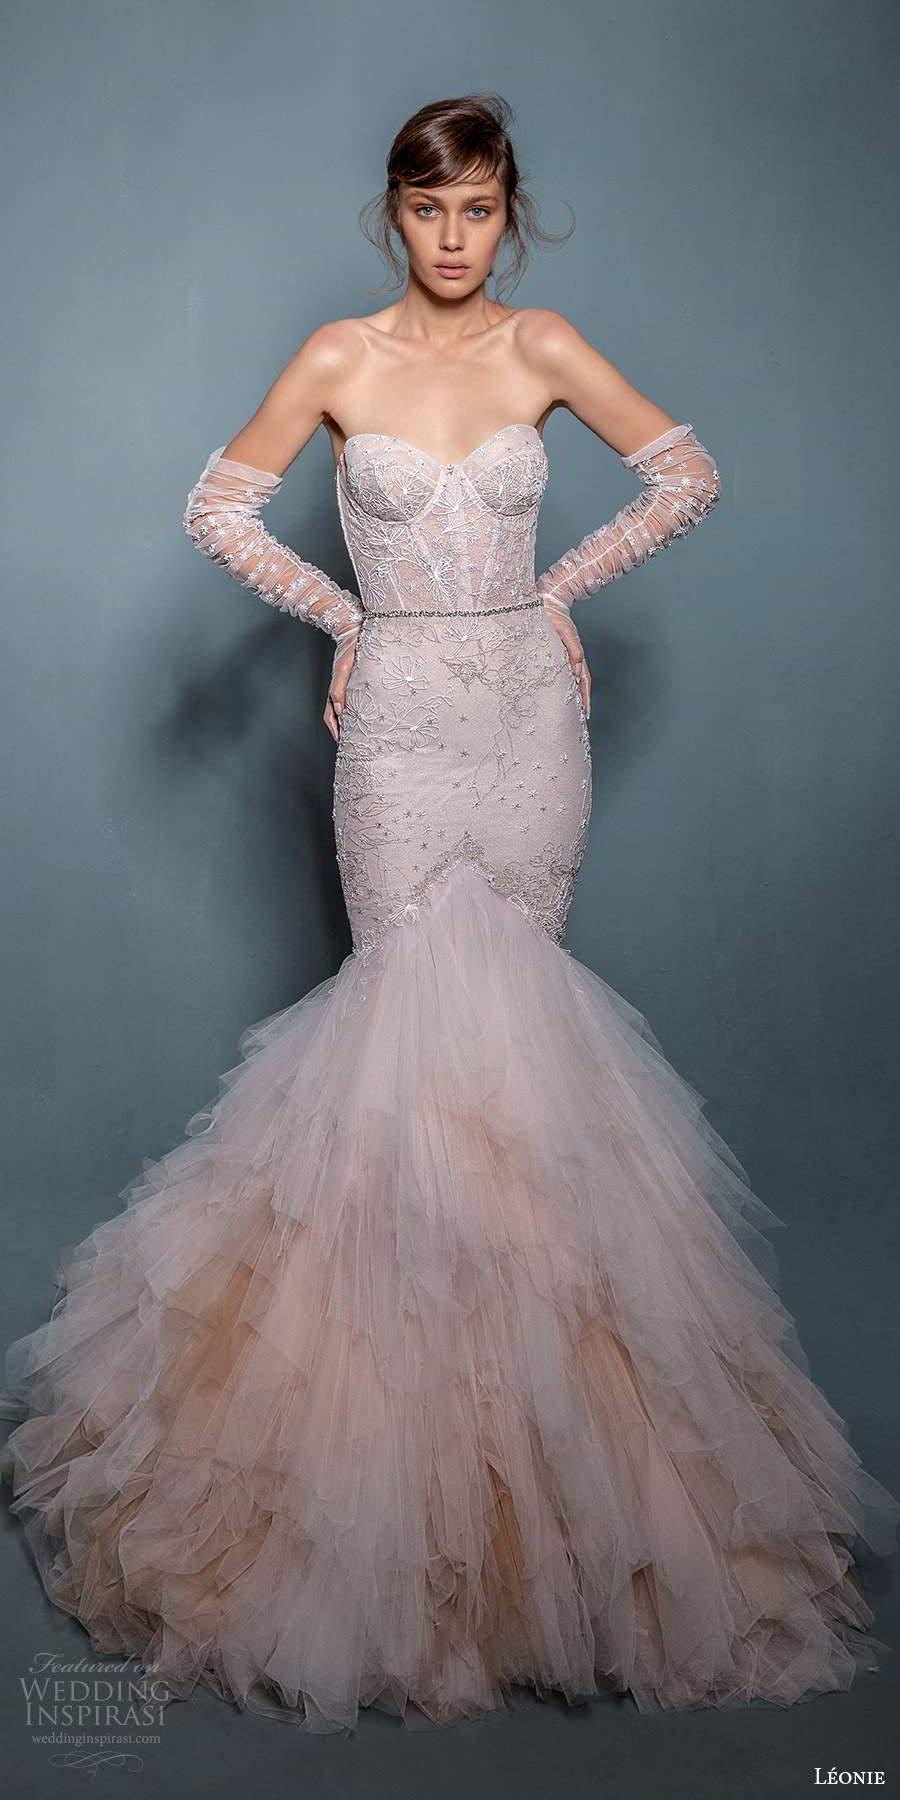 leonie bridal 2020 bridal strapless sweetheart neckline embellished fit flare mermaid wedding dress chapel train gloves (3) mv